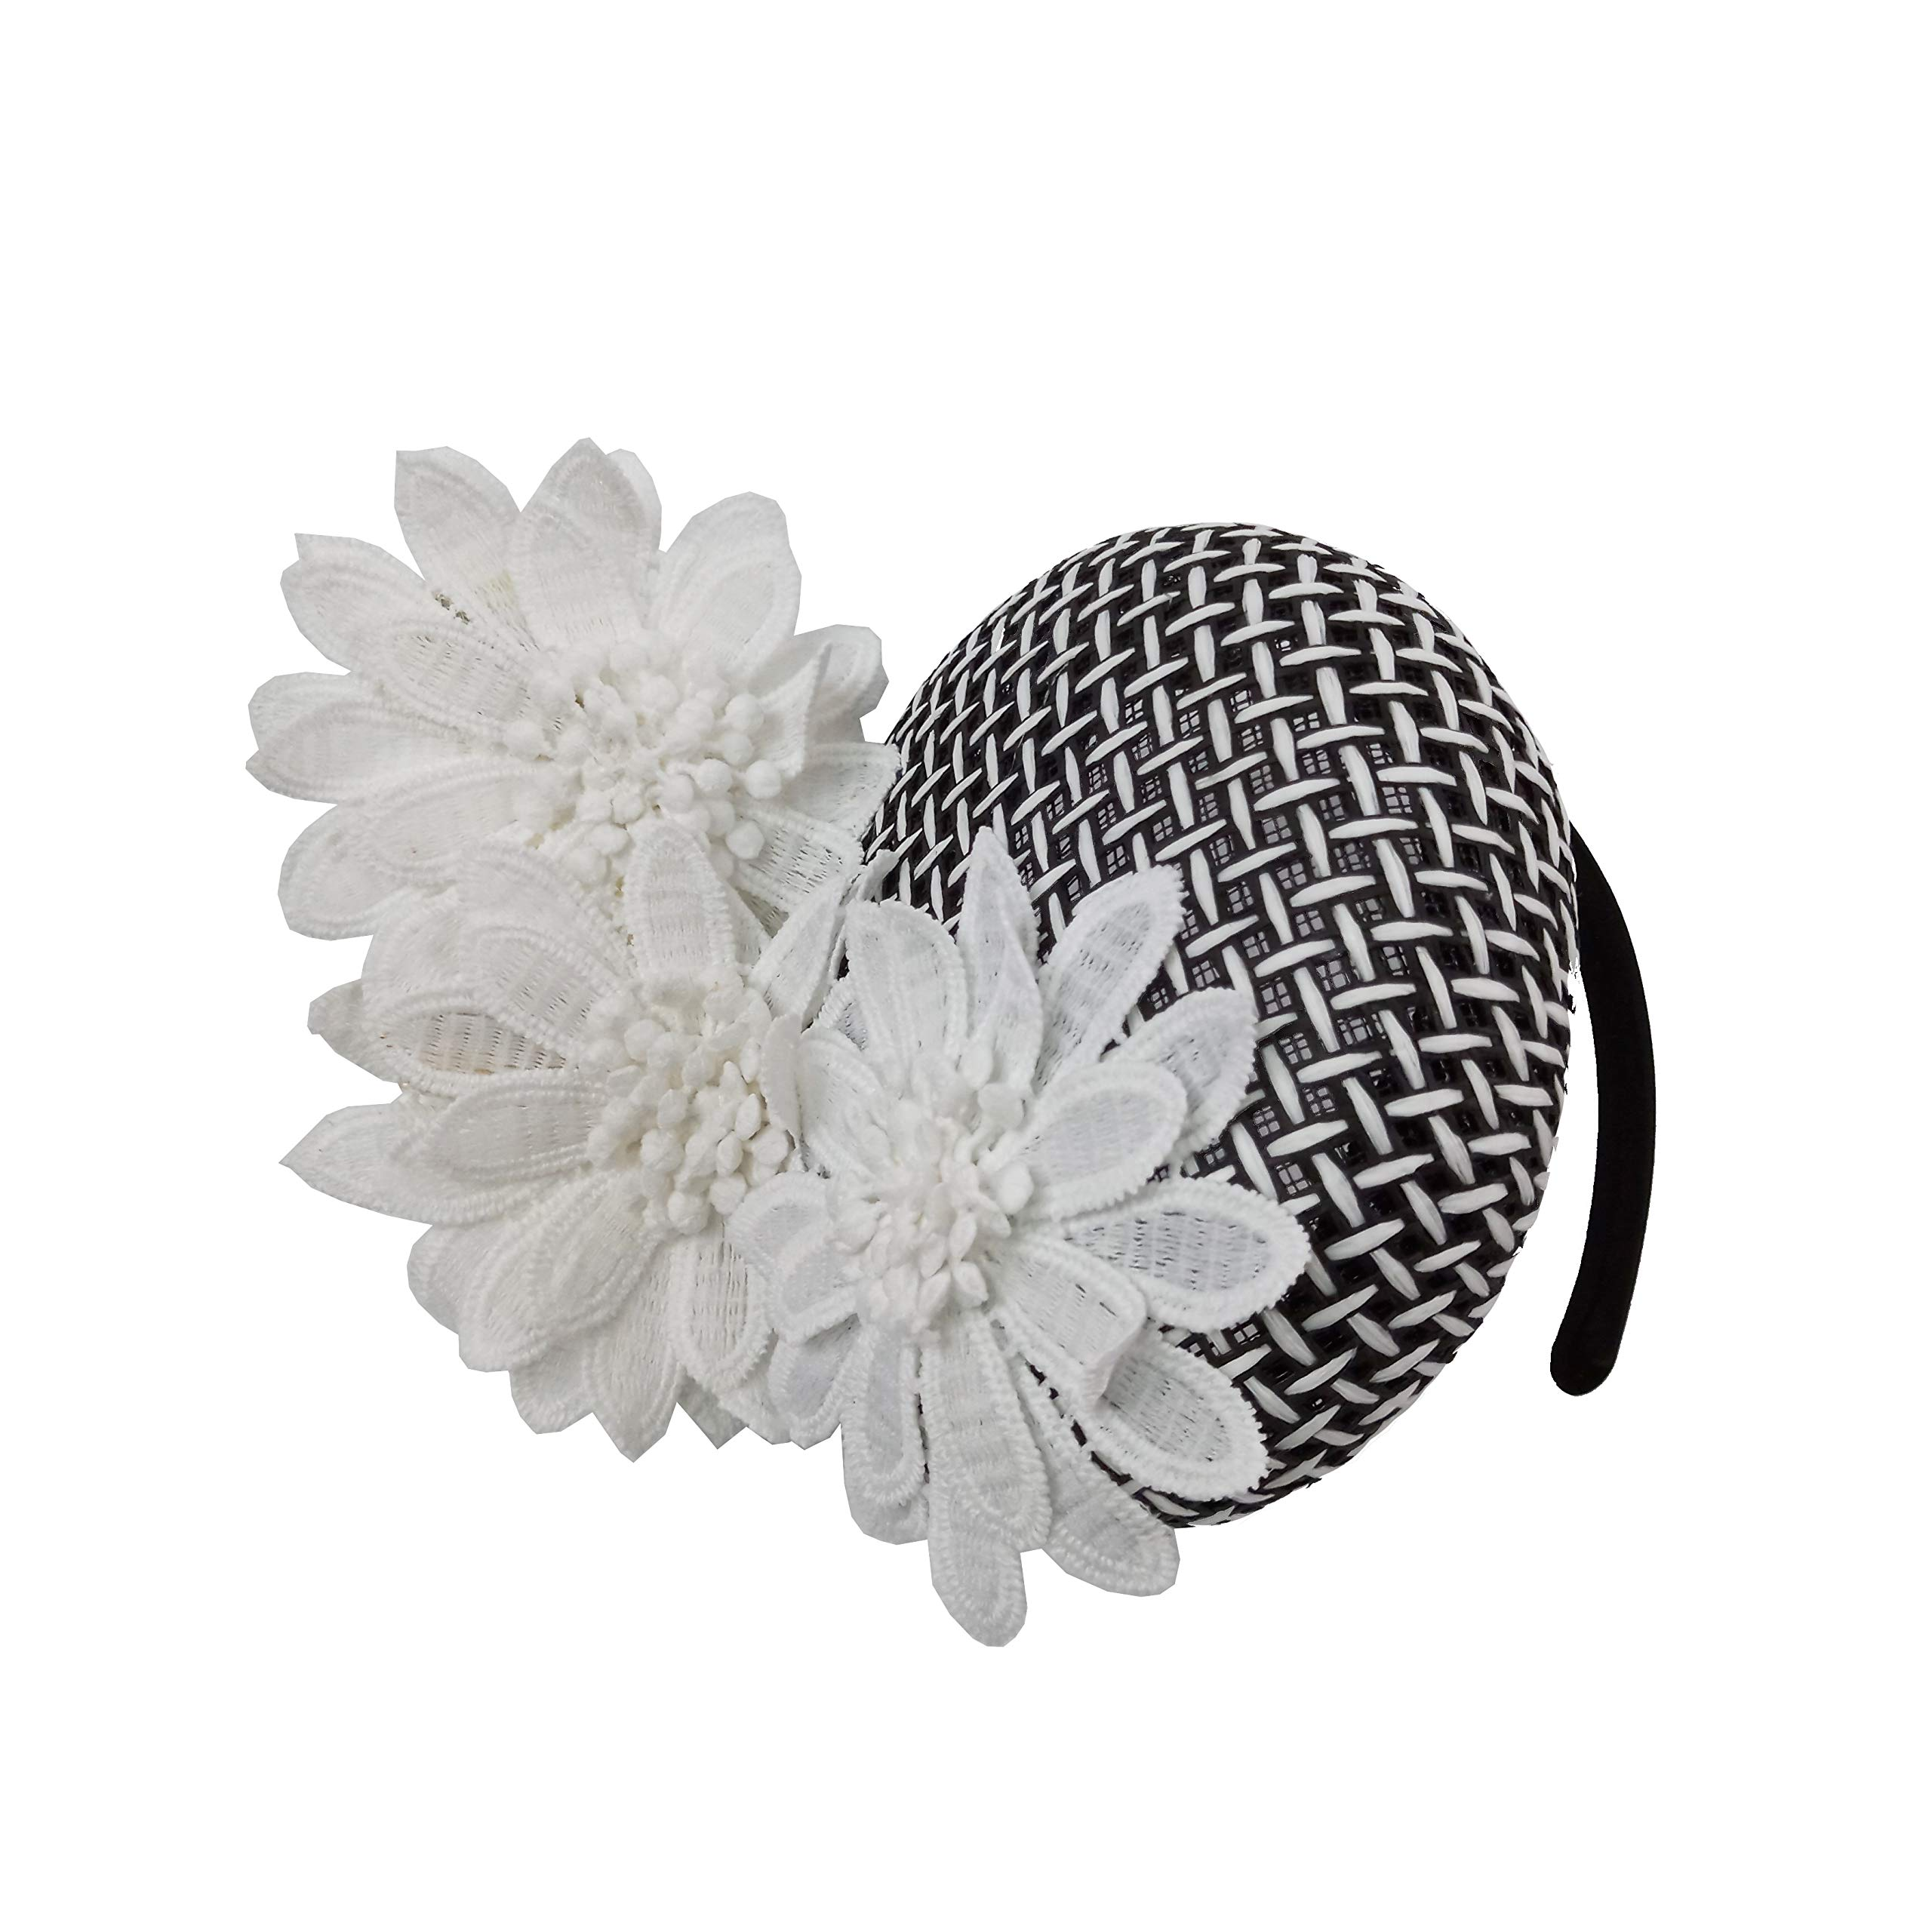 White/Multi Daisy Lace Grid Paper Straw Fascinator Headband Hats Tea Party Hats